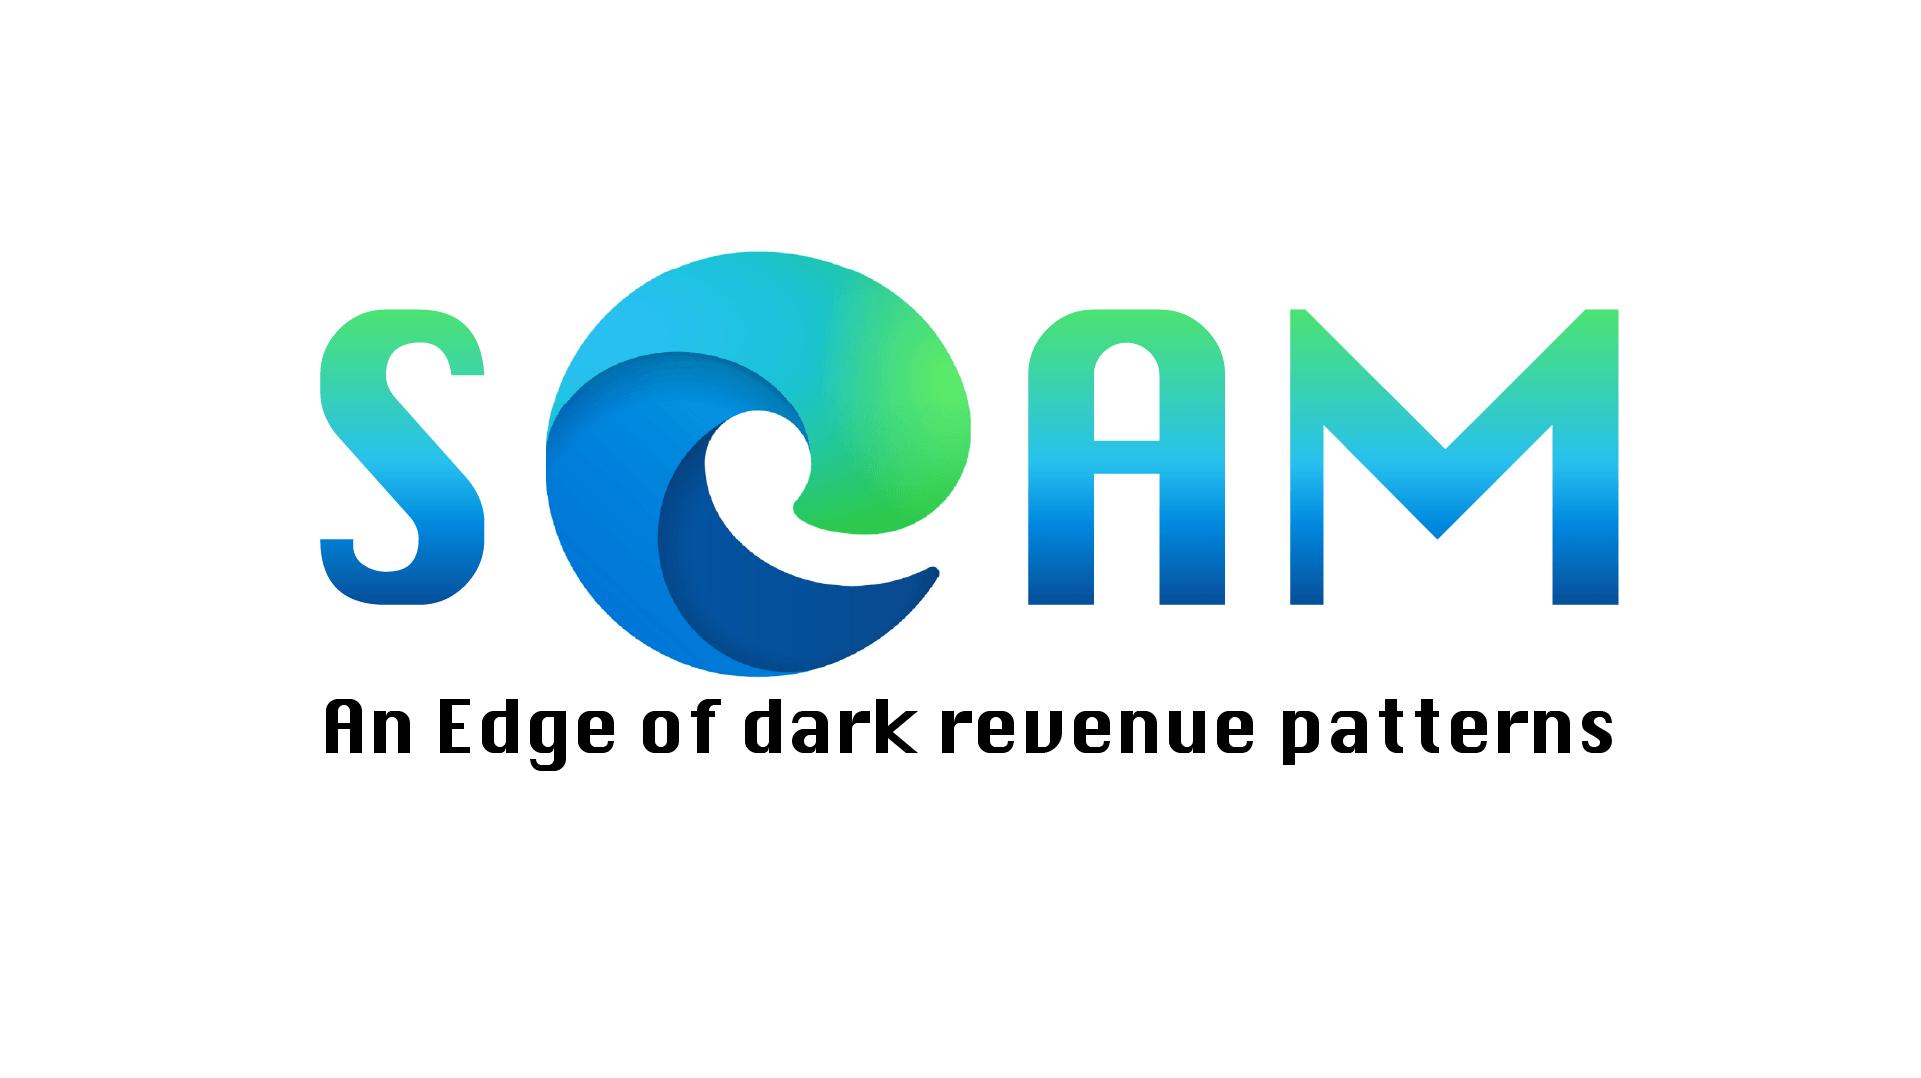 an edge of dark revenue patterns